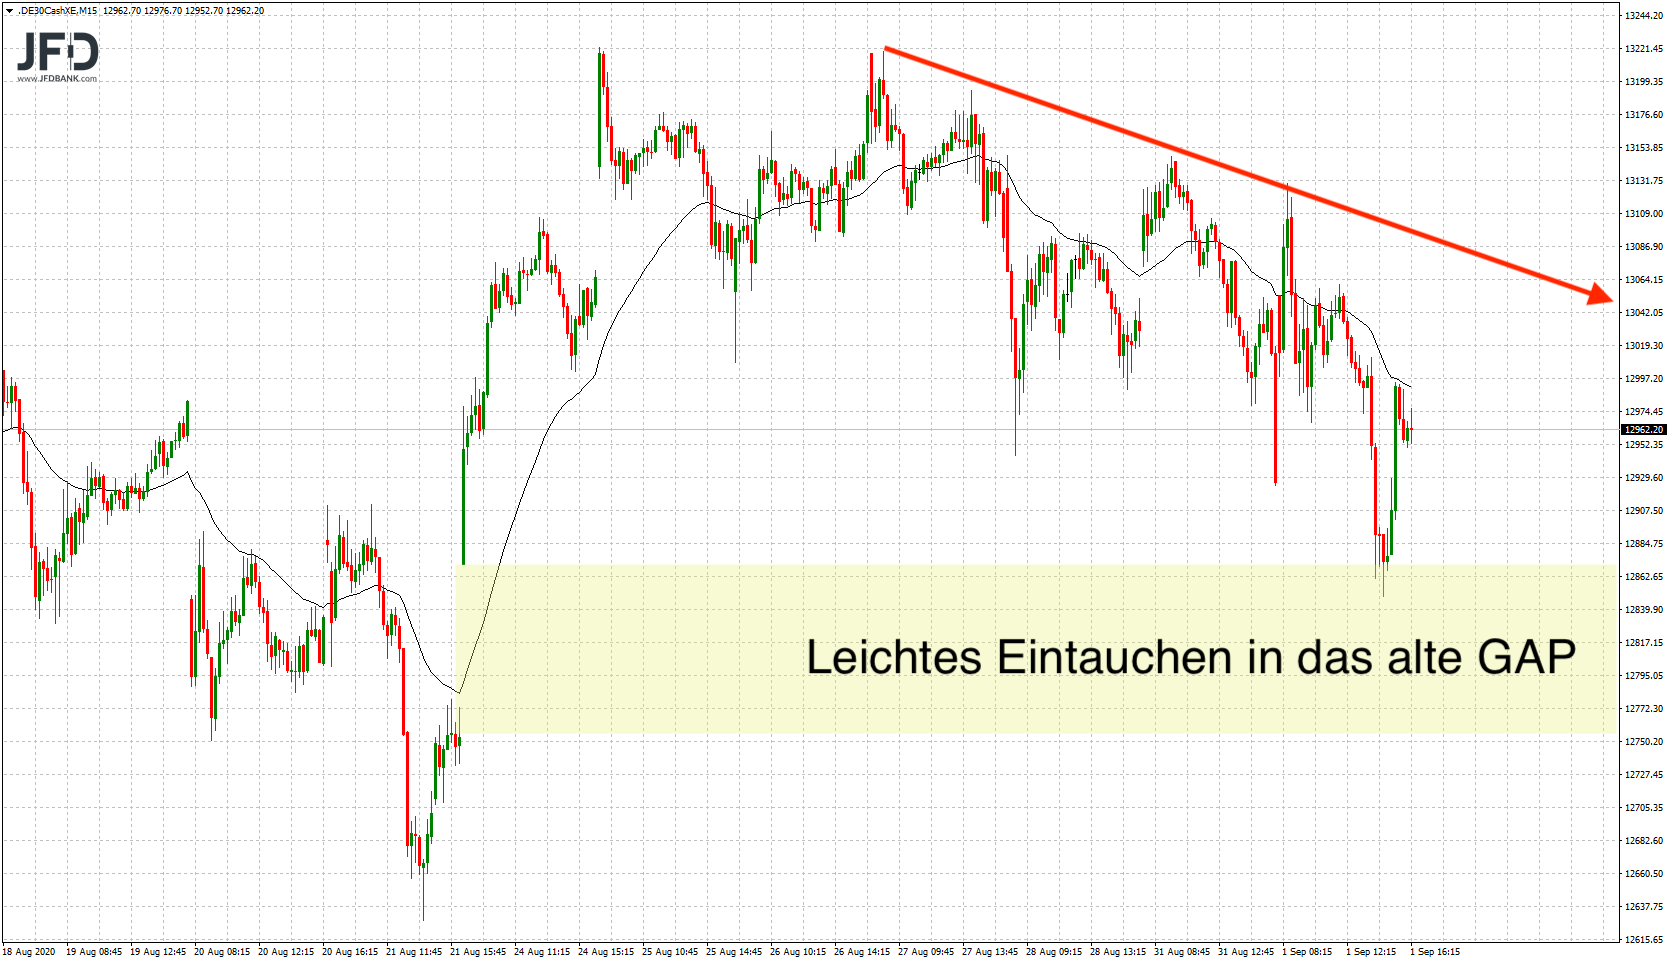 DAX-volatil-in-den-September-gestartet-Kommentar-JFD-Bank-GodmodeTrader.de-4